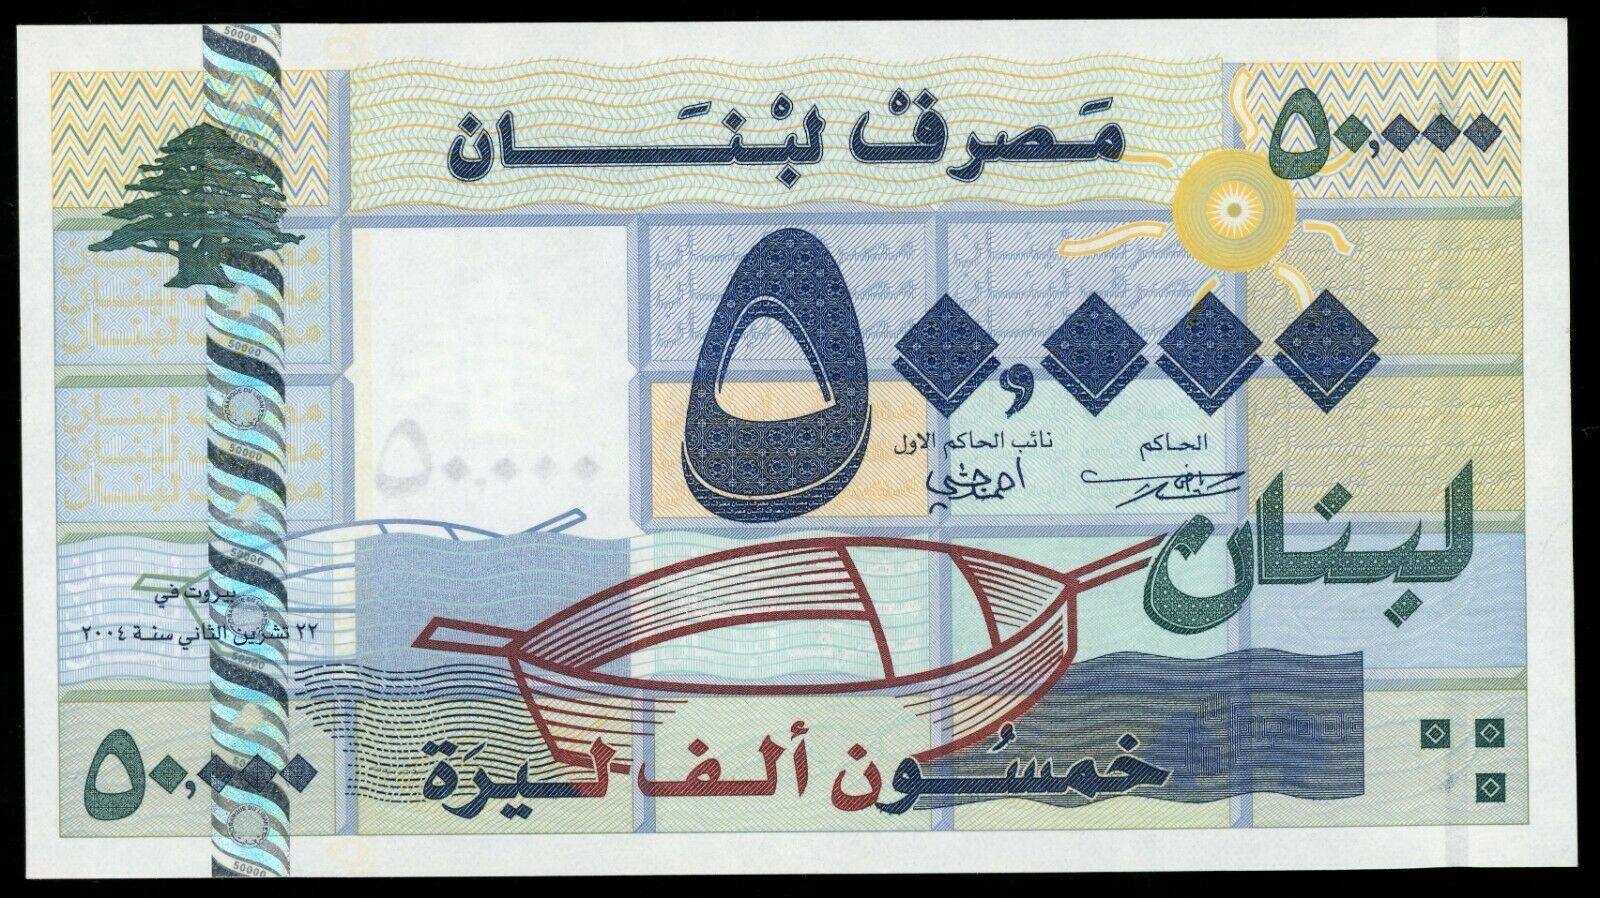 LIBANON 50 000 ливров 2004 P-88 UNC